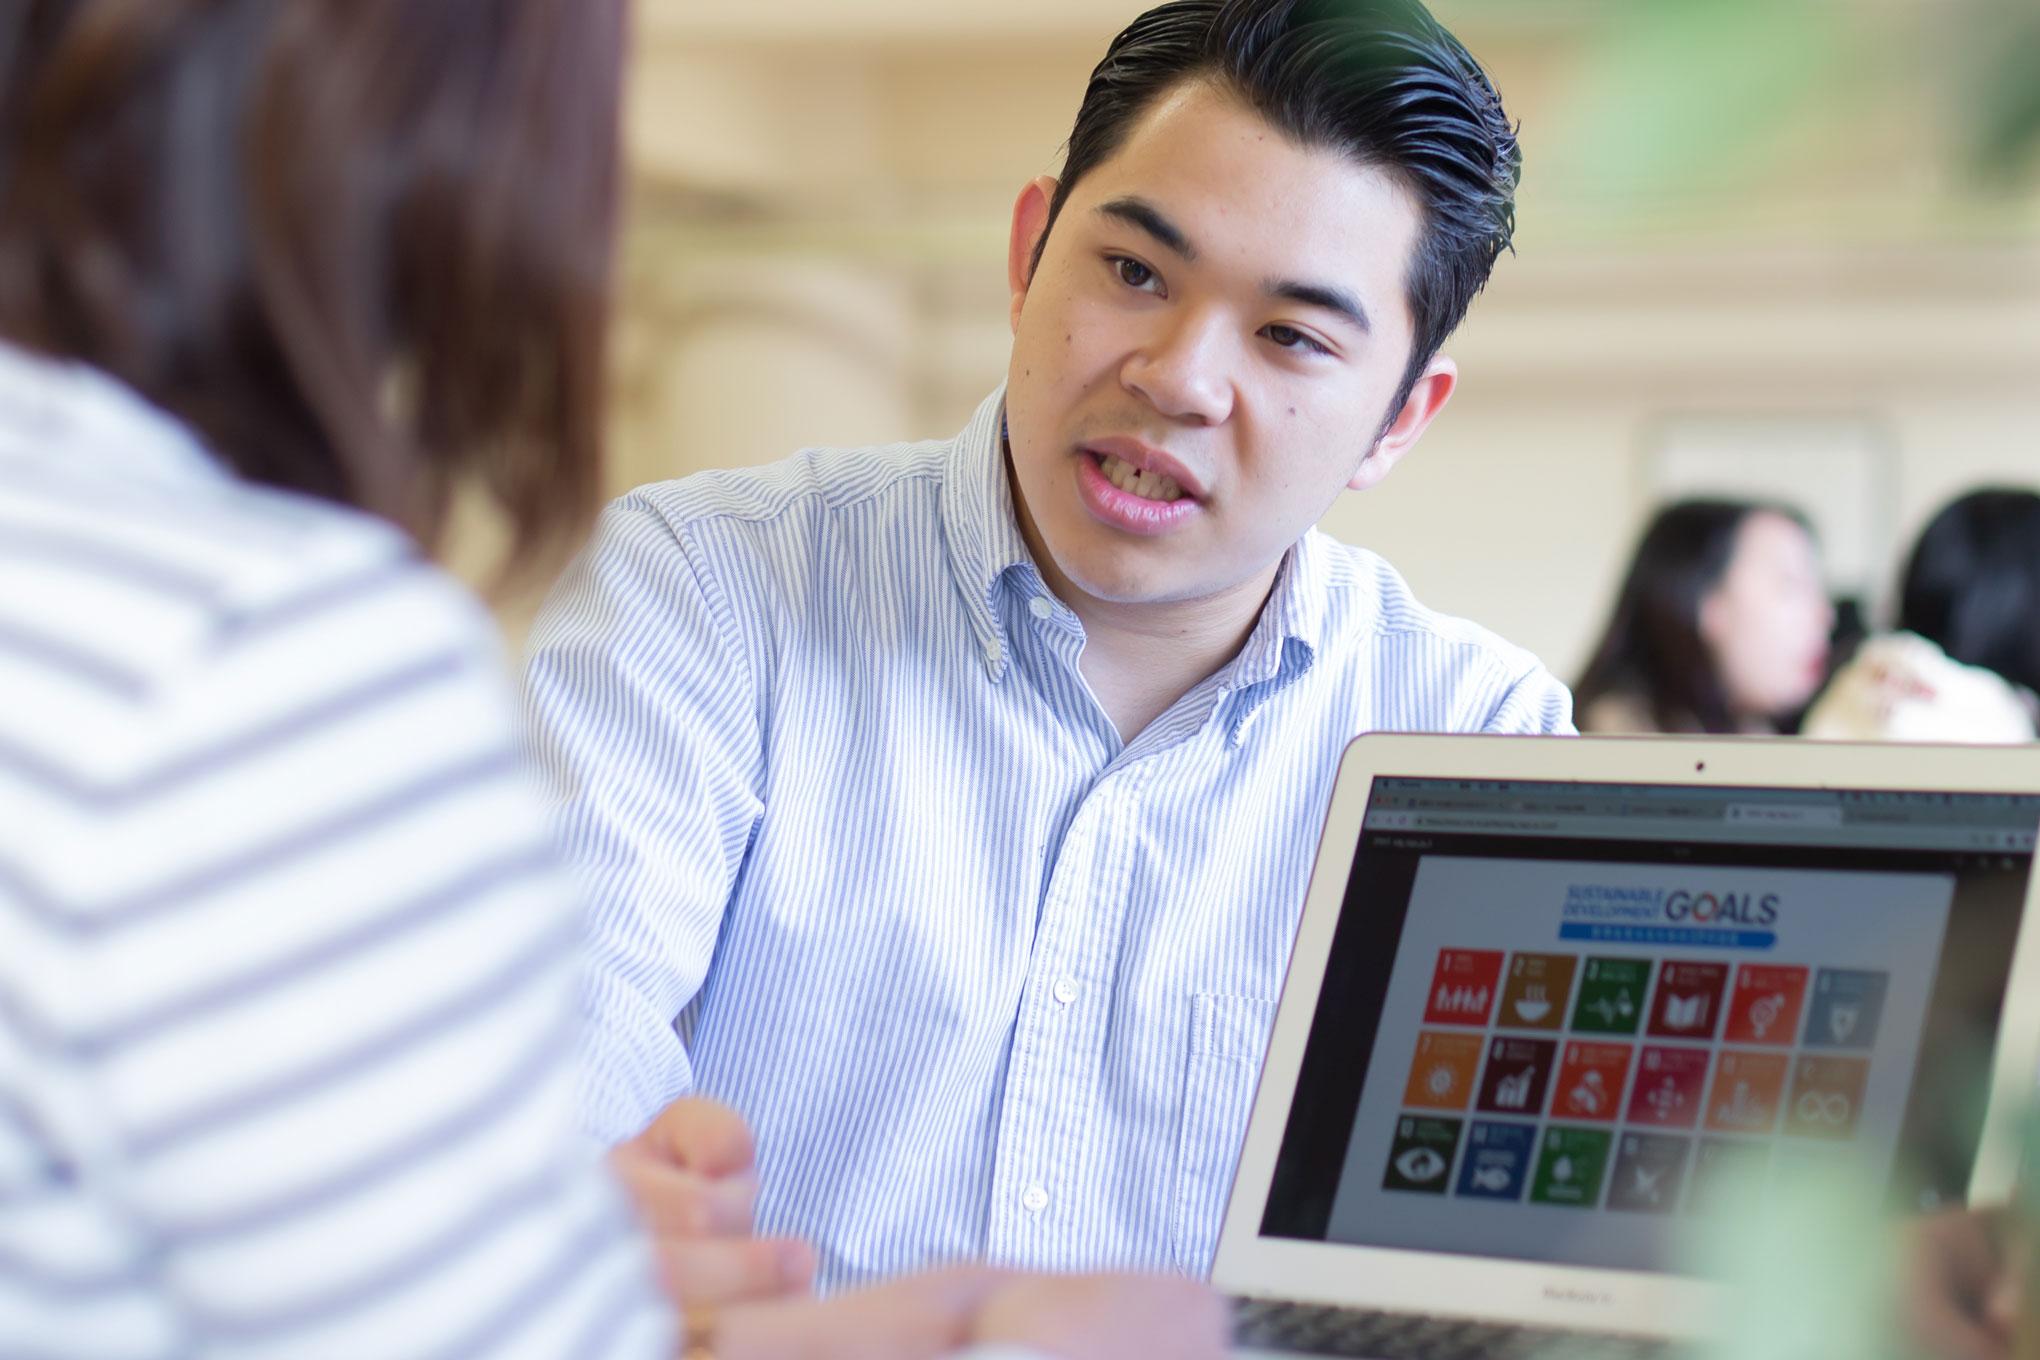 SDGs 活動を通じ、世の中を少しでも良くしたい